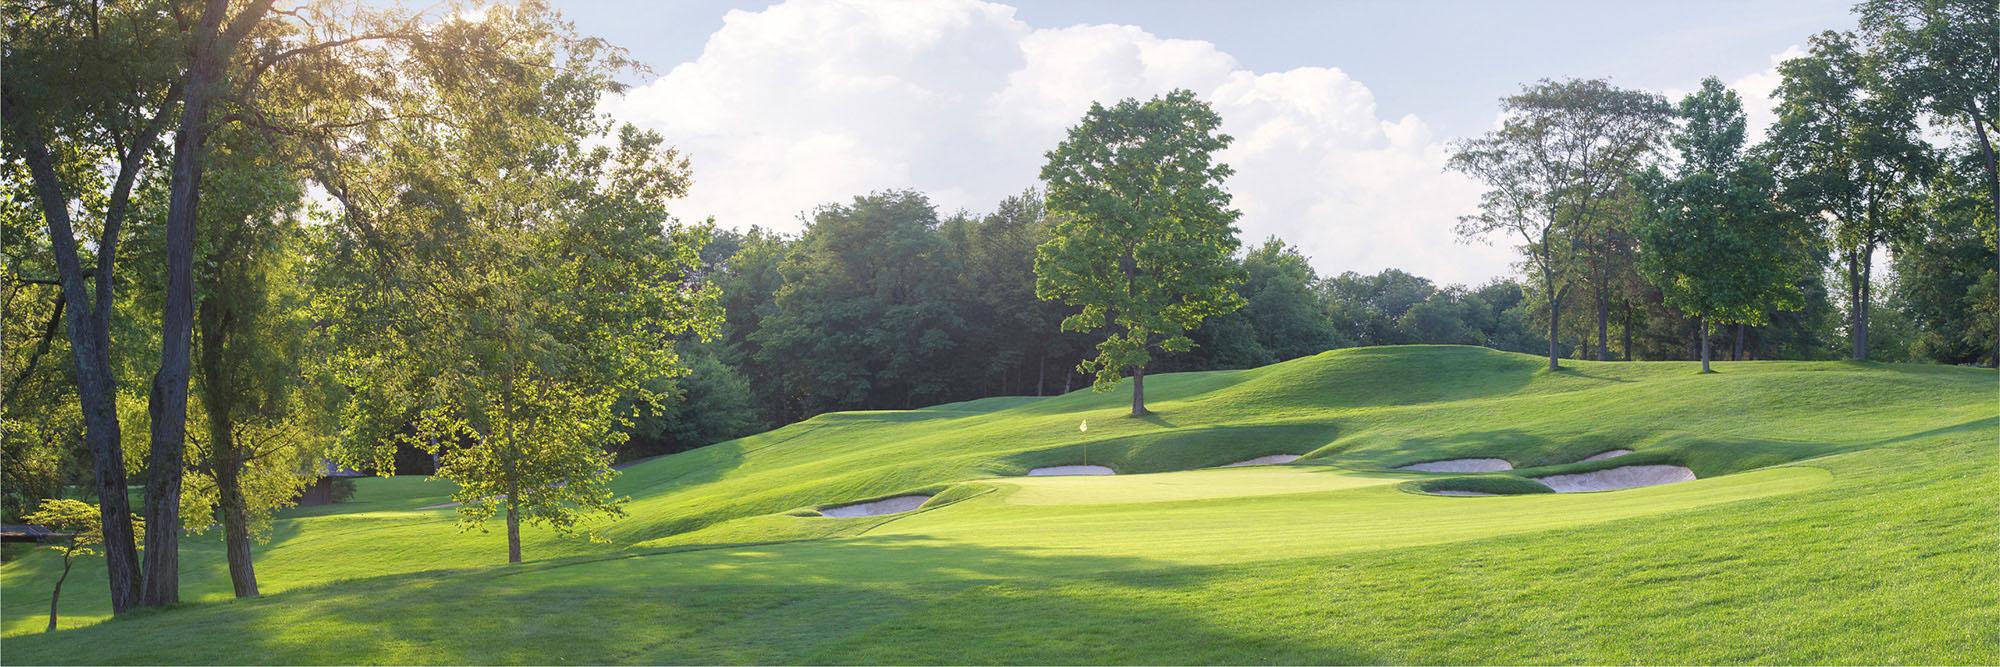 Golf Course Image - Muirfield Village No. 4